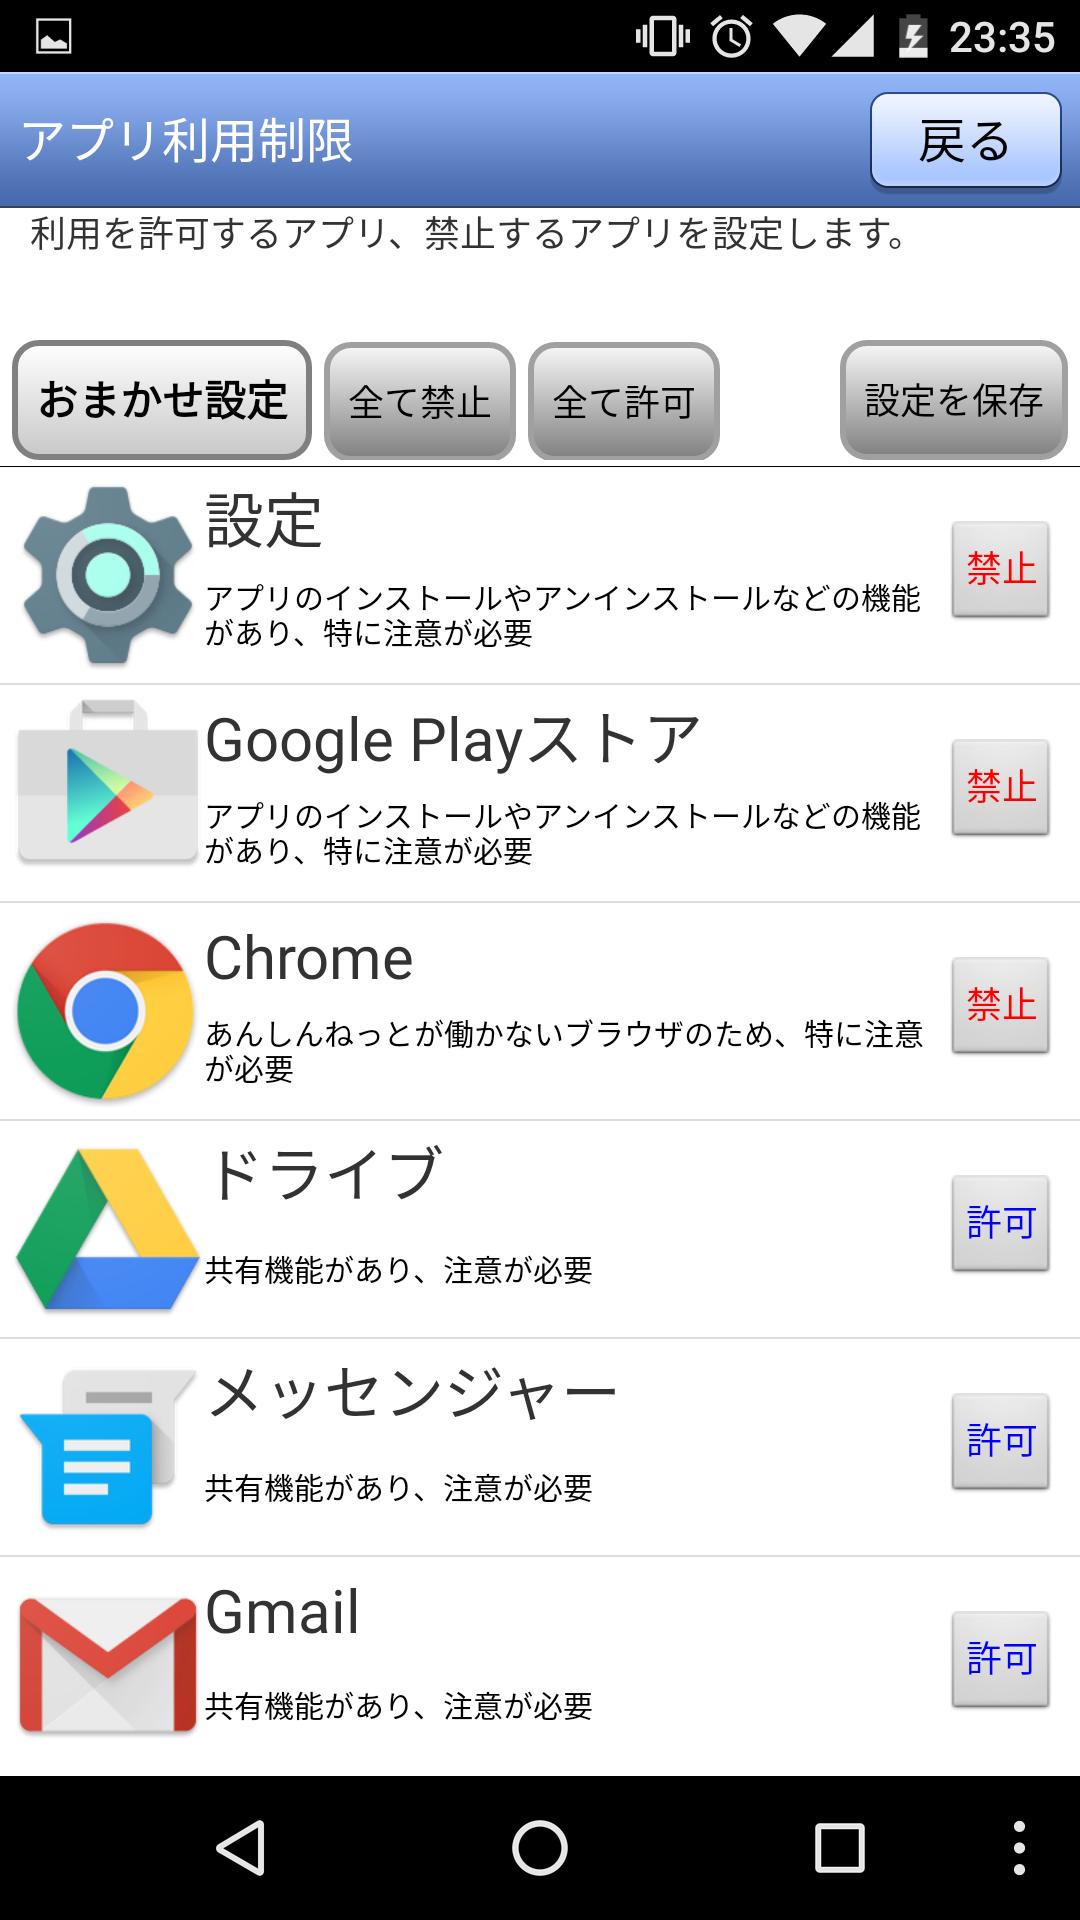 Screenshot_20151024-233536